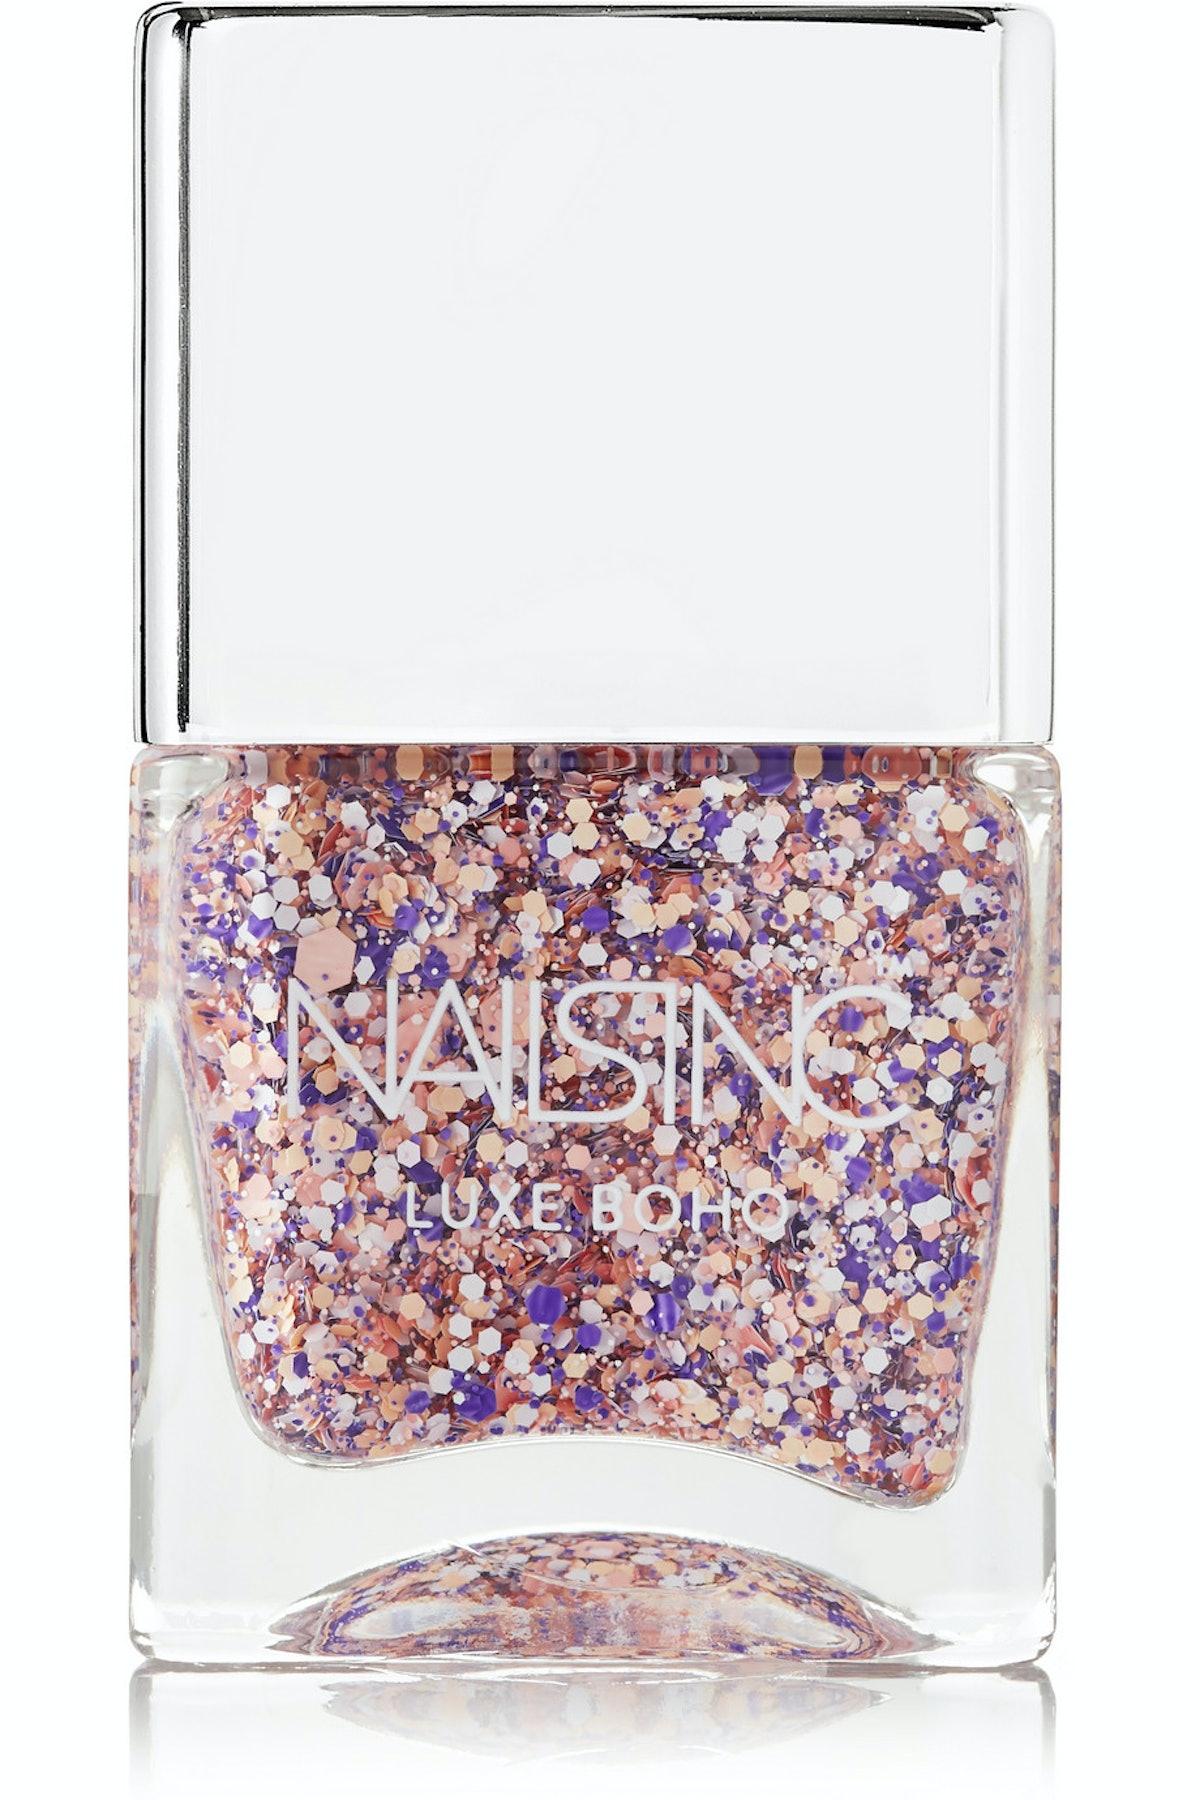 Nails Inc nail polish, $15, NET-A-PORTER.COM